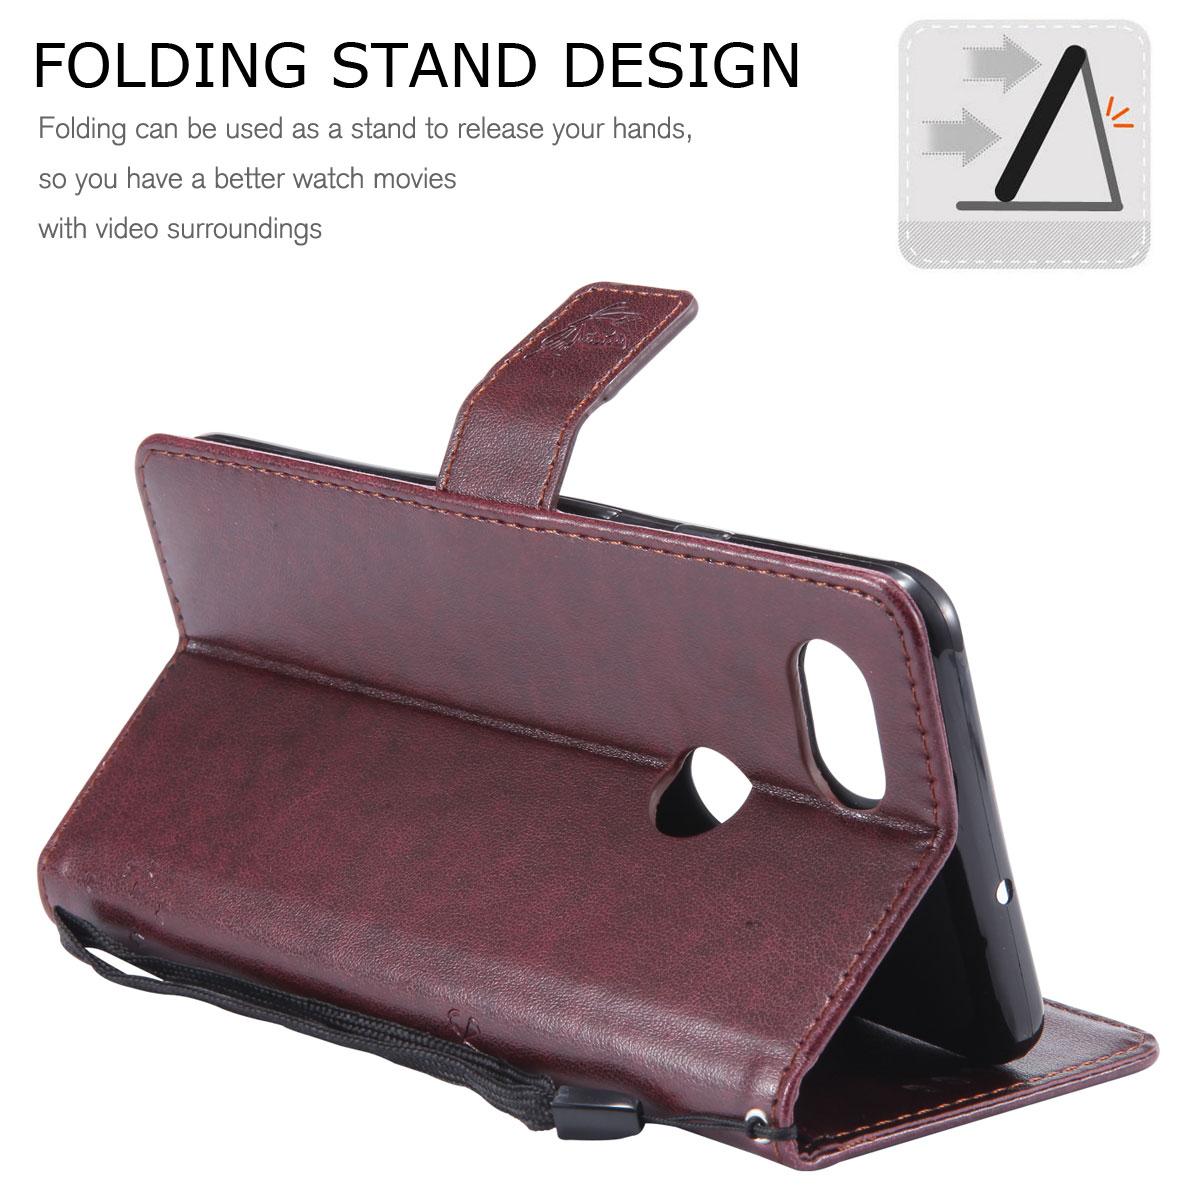 Magnetic-Leather-Credit-Card-Holder-Flip-Case-Cover-For-Google-Pixel-2-2-XL thumbnail 78